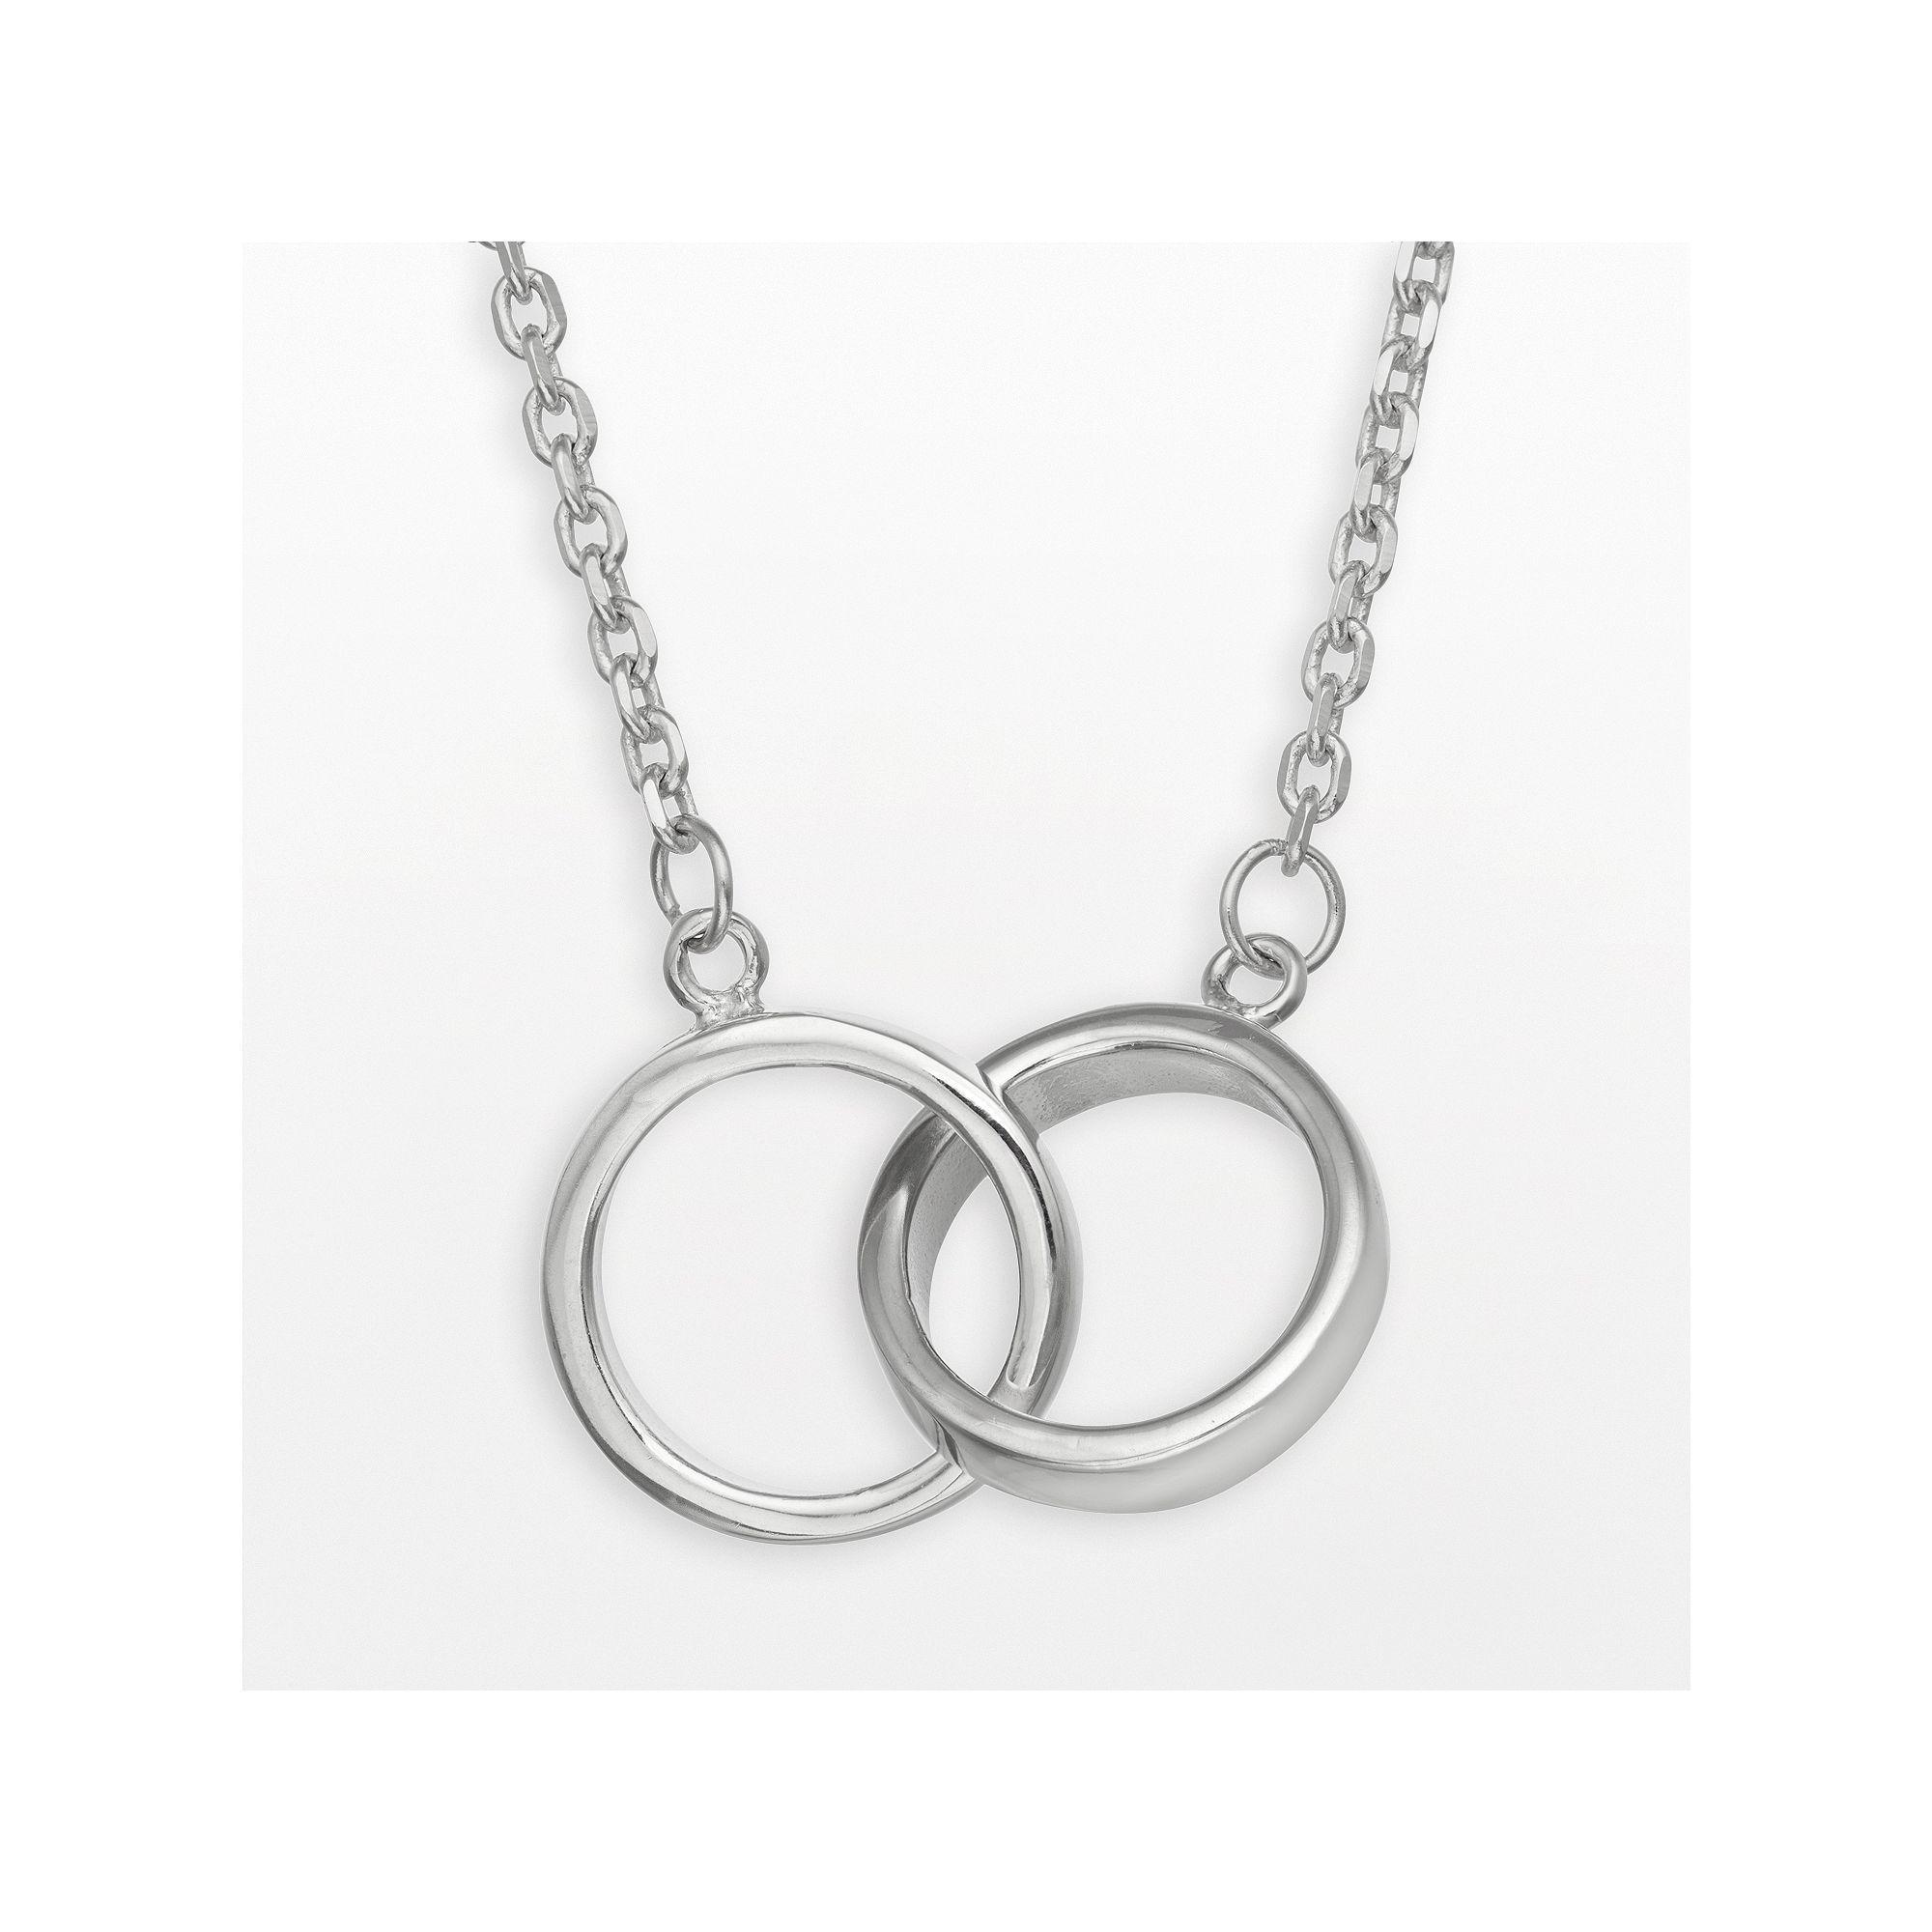 Kohlus sterling silver interlocking circle infinity necklace